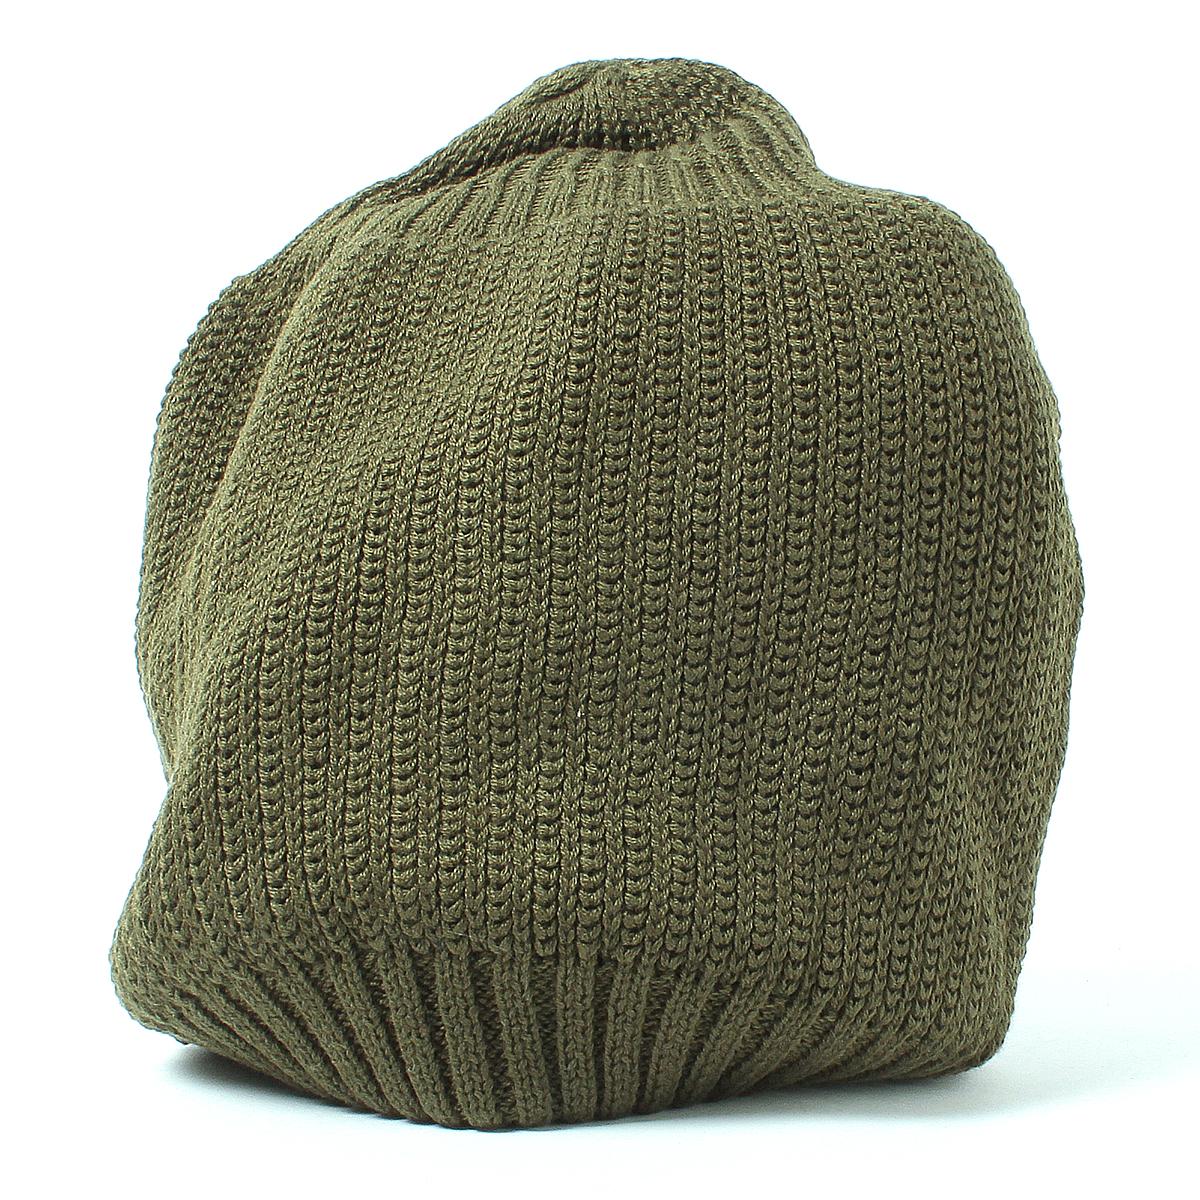 000c45a846a Hats and Caps River-Up  Slim fit knit Cap unisex